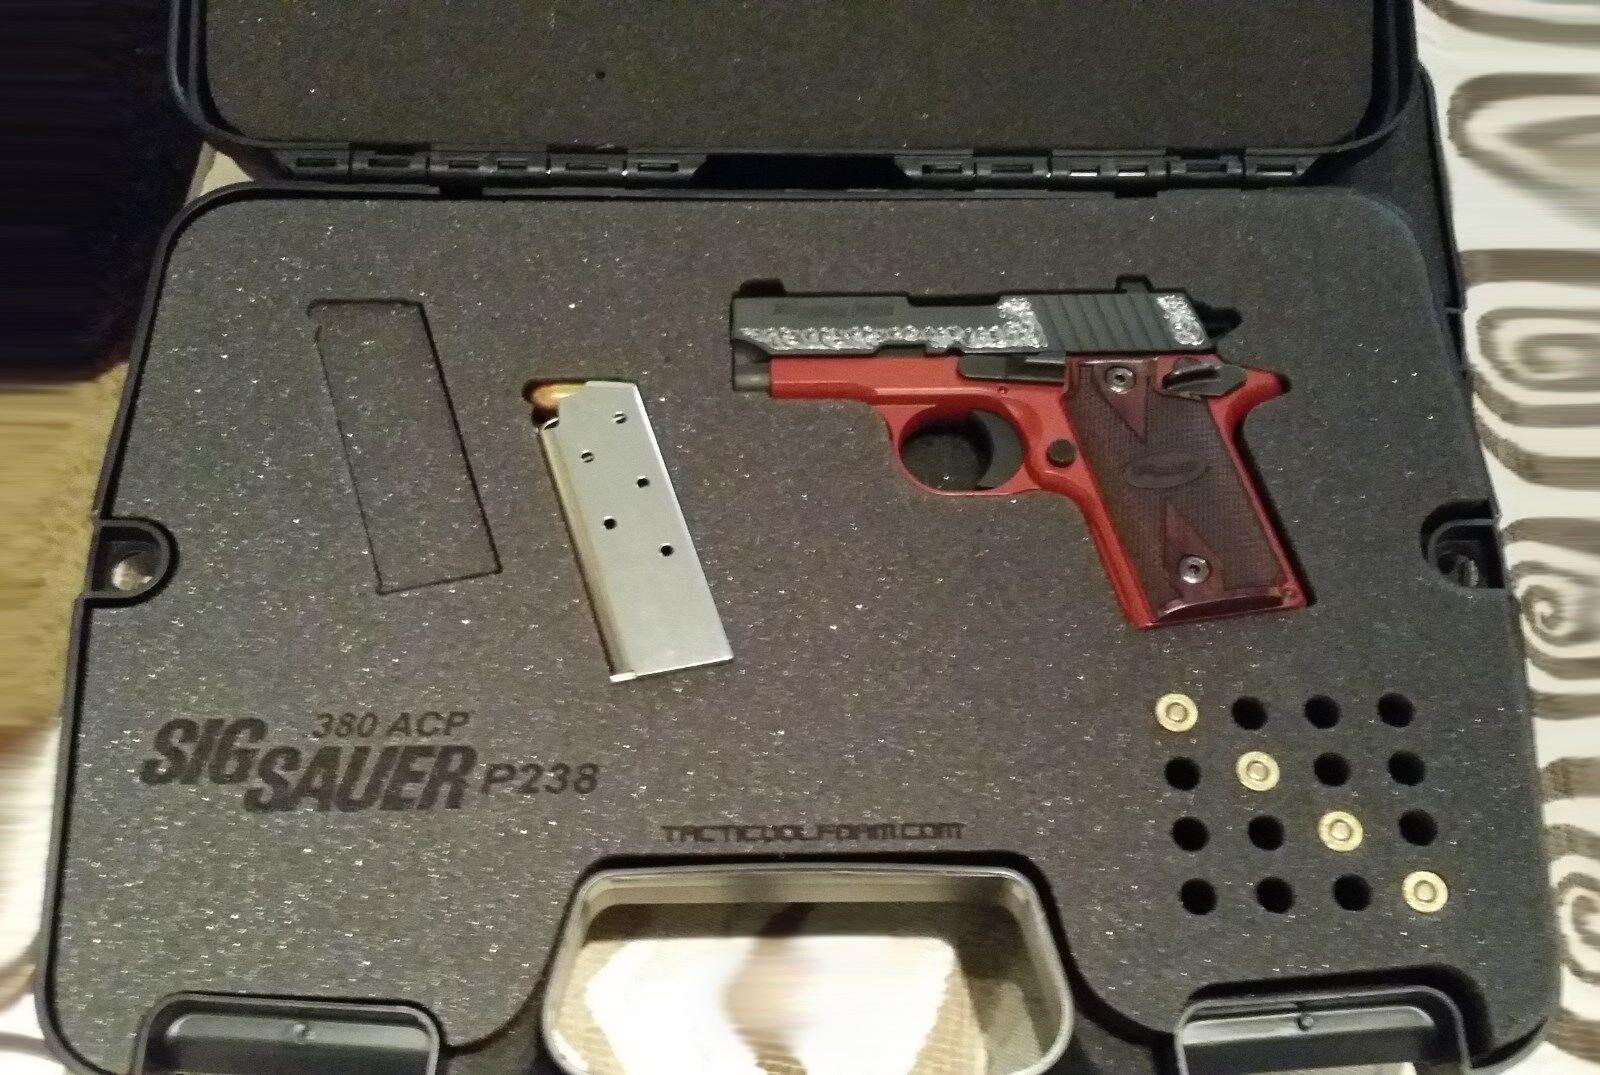 Custom Case for - Sig Sauer P238  (.380) Pistol - for Laser Cut Inserts Perfect Fit 8de331